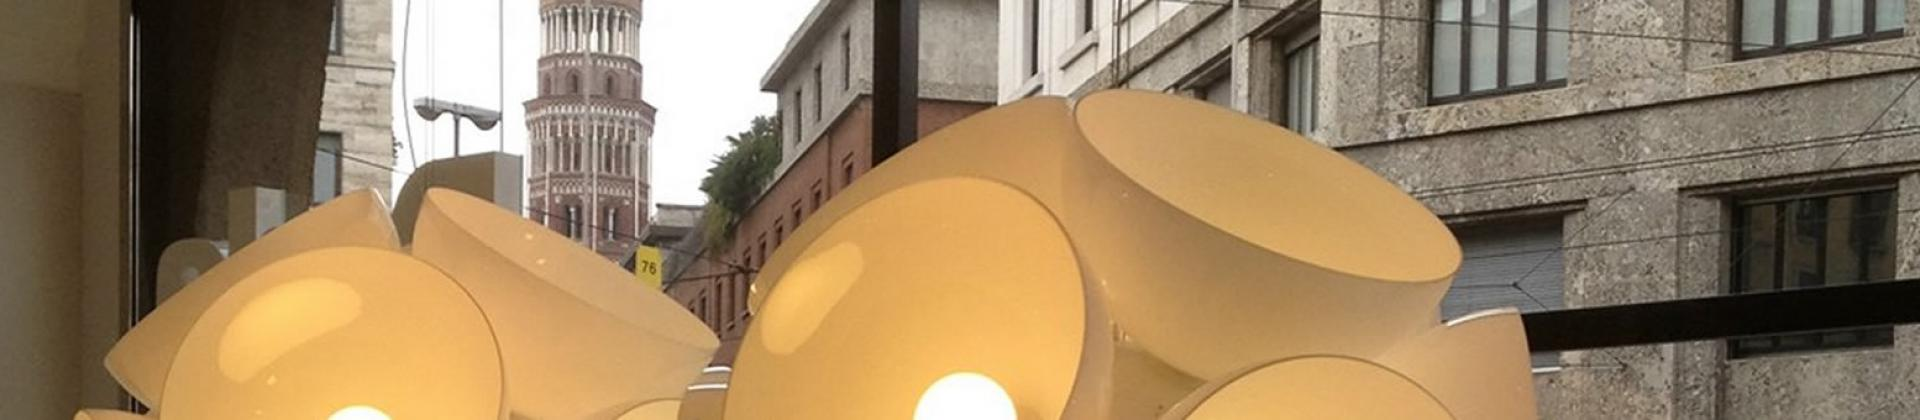 CHi Penta - Lámparas de diseño